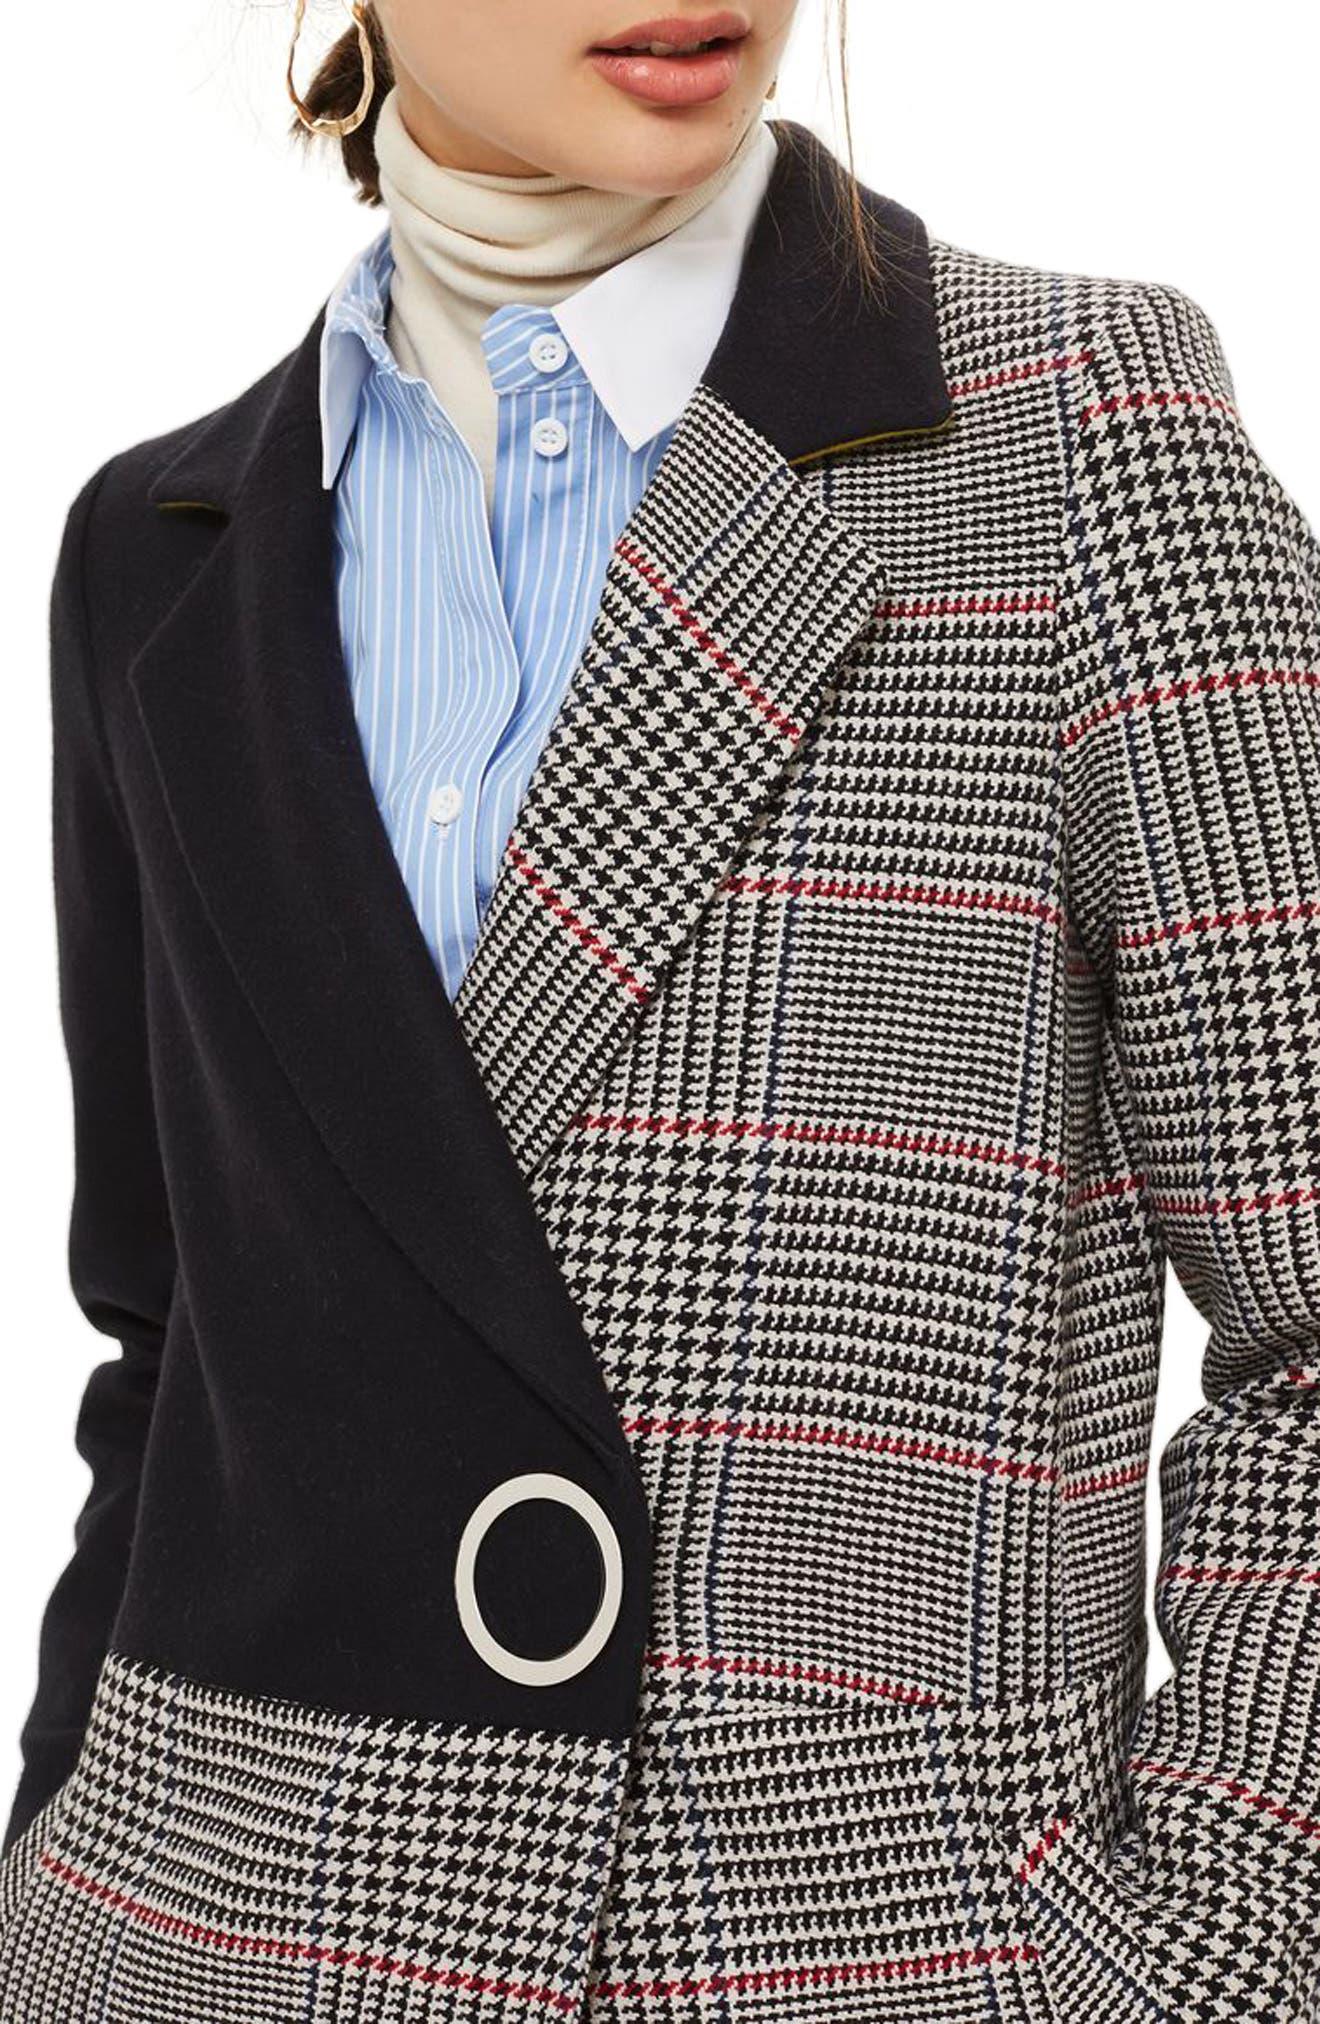 Alternate Image 1 Selected - Topshop Colorblock Check Wool Blend Coat